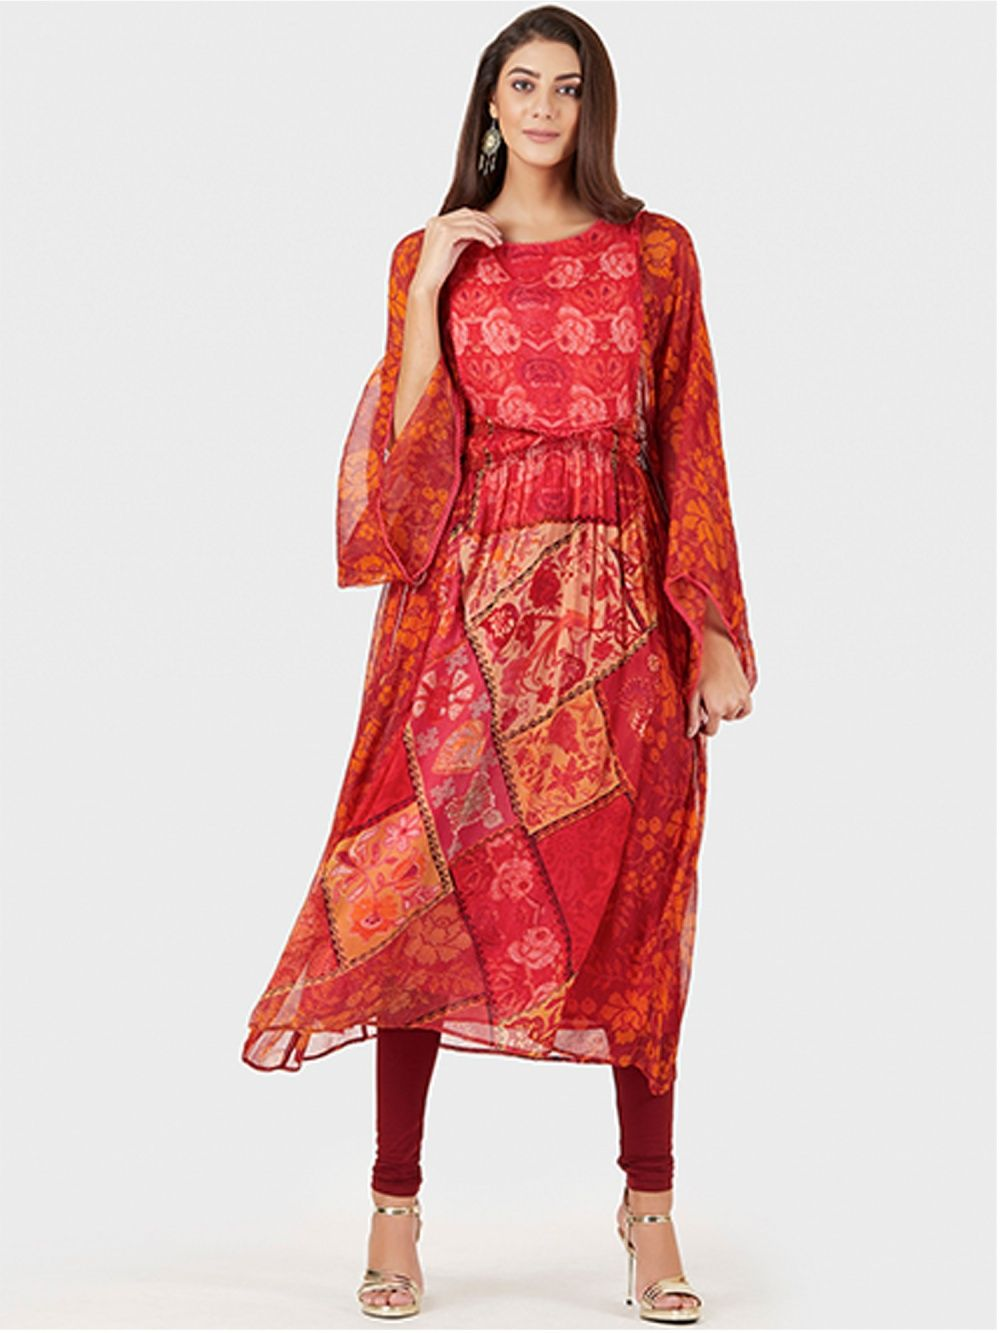 db2372527fa Ritu Kumar Salwar Suits and Sets   Buy Ritu Kumar Boat Neck Full ...